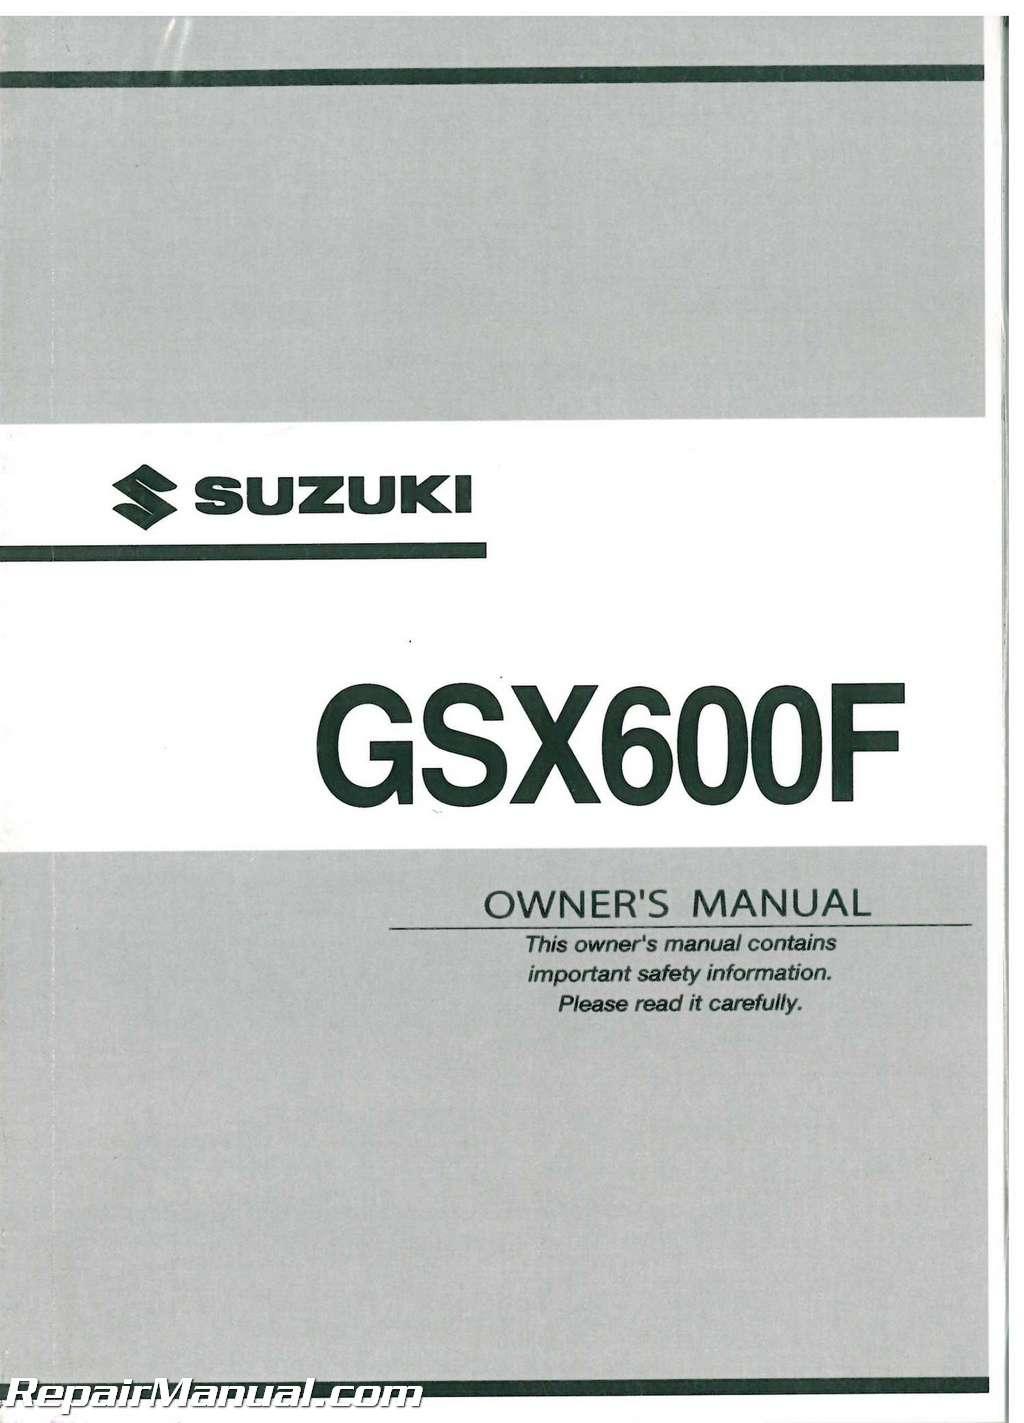 2003 suzuki katana gsx600f motorcycle owners manual 99011 19c65 rh ebay co uk suzuki gsx600f service manual free suzuki gsx600f repair manual